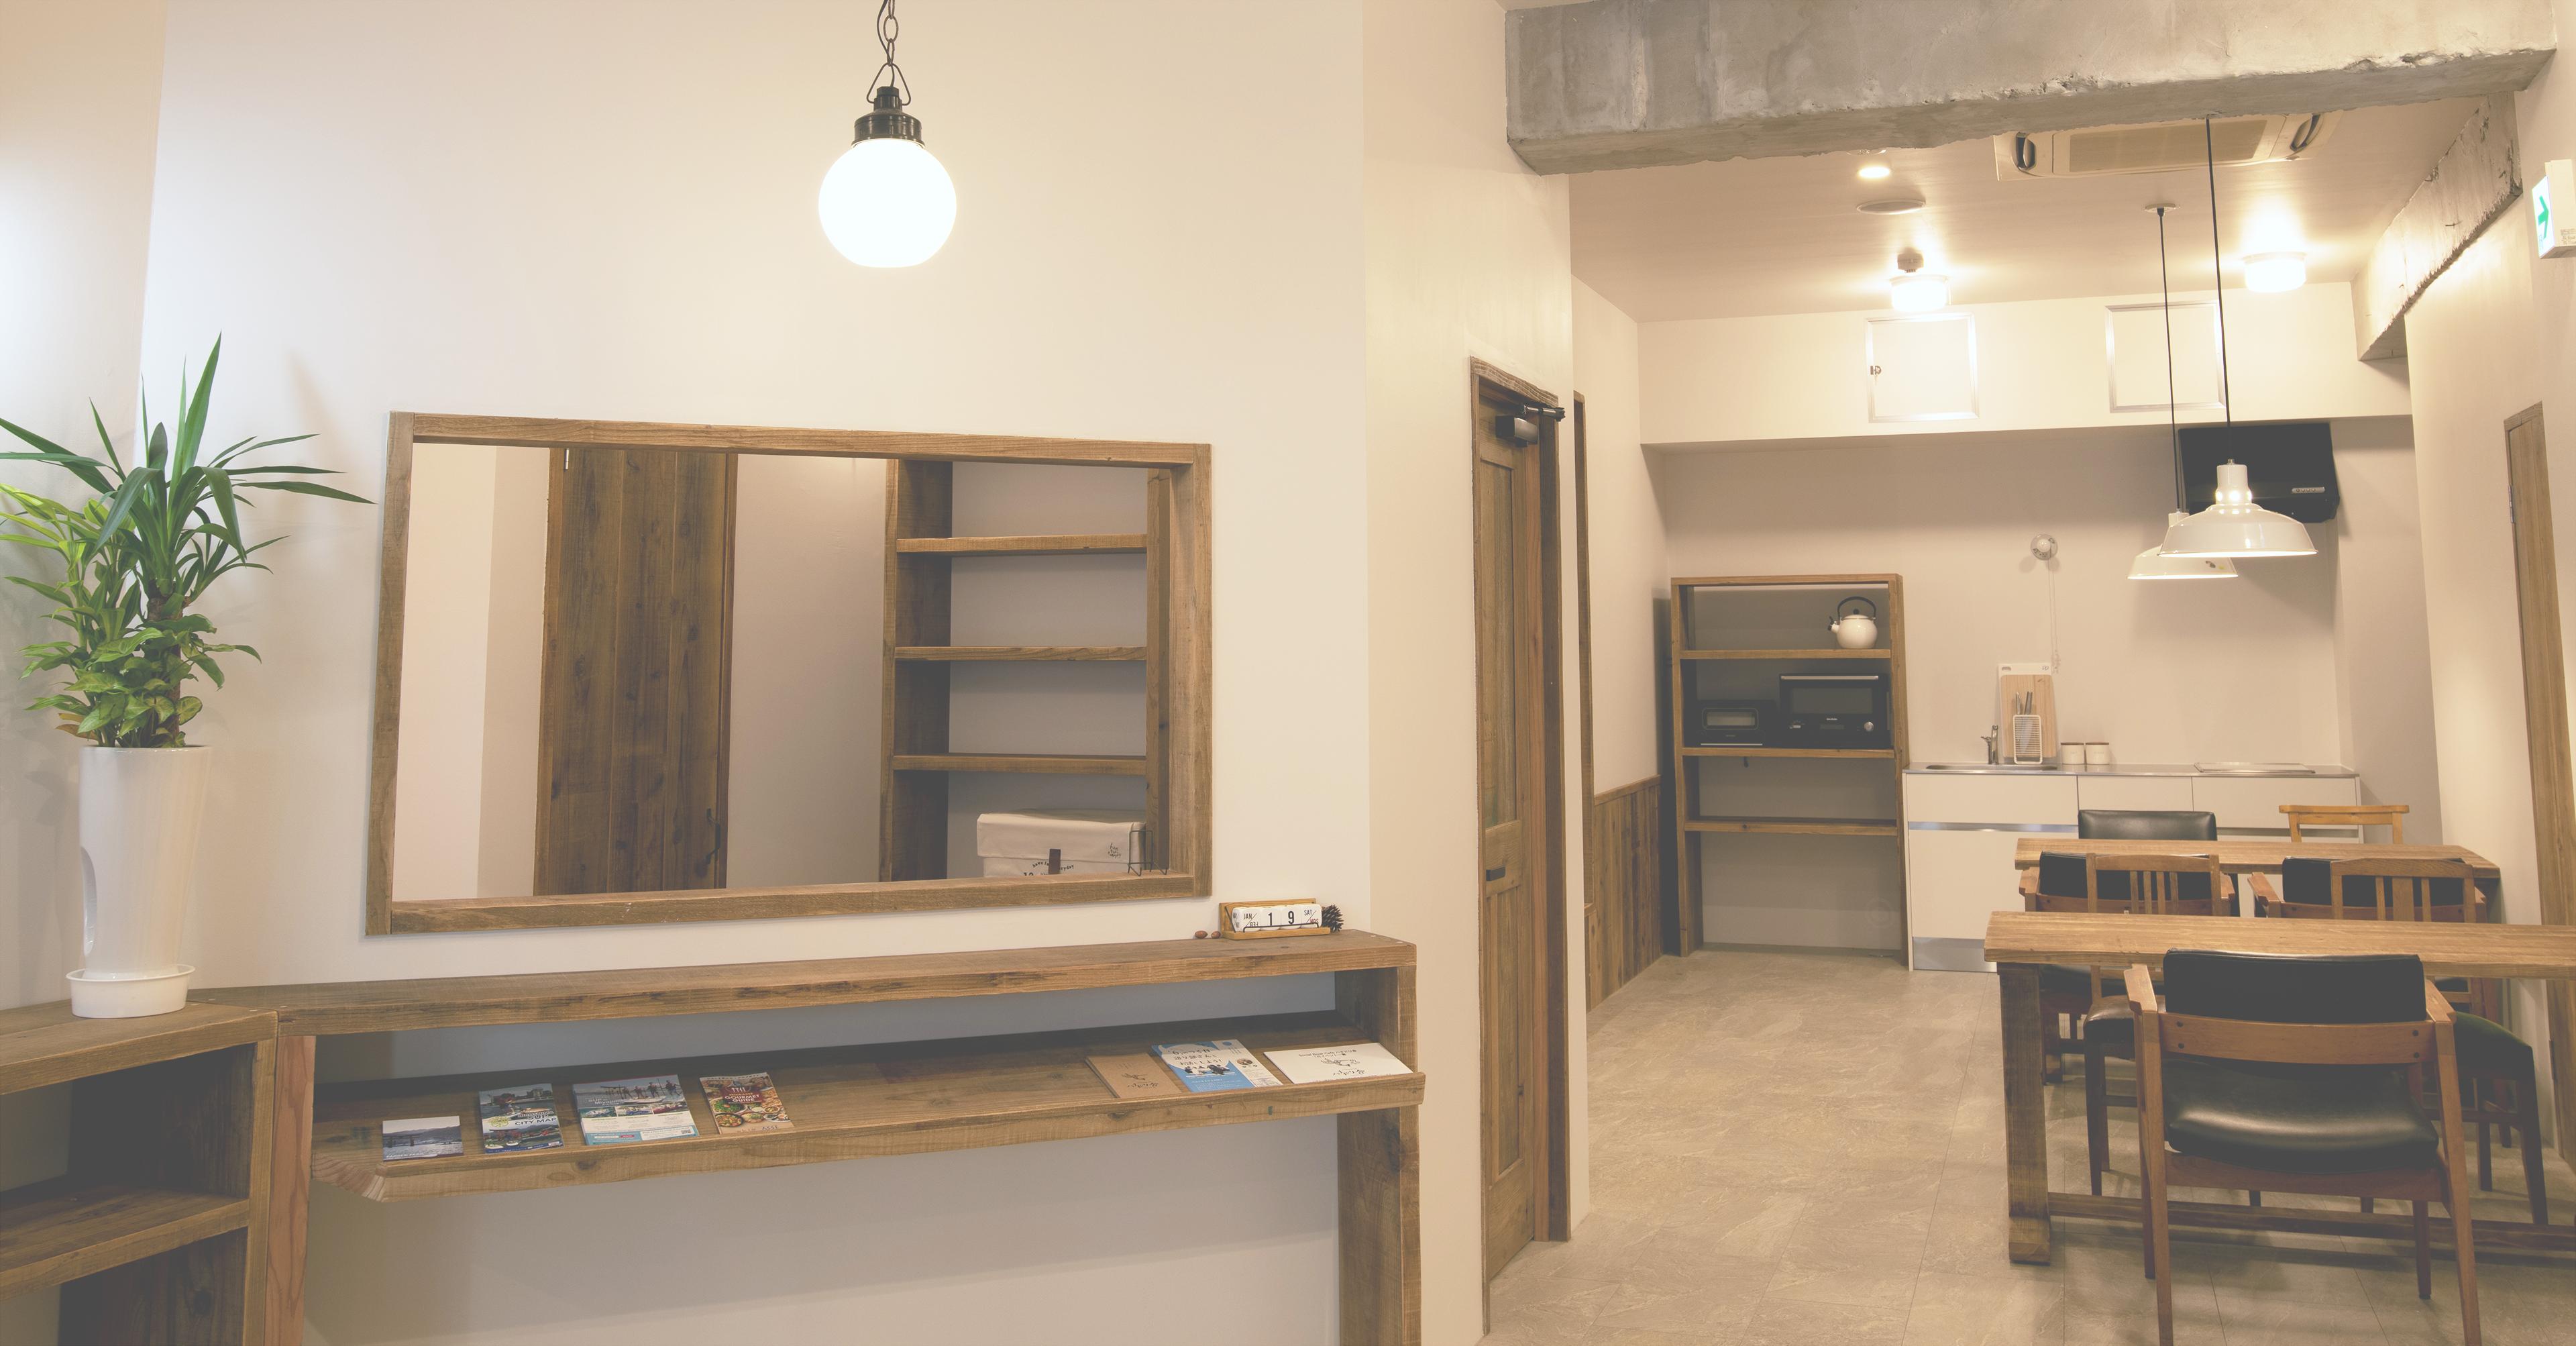 akicafe inn guesthouseの受付の画像